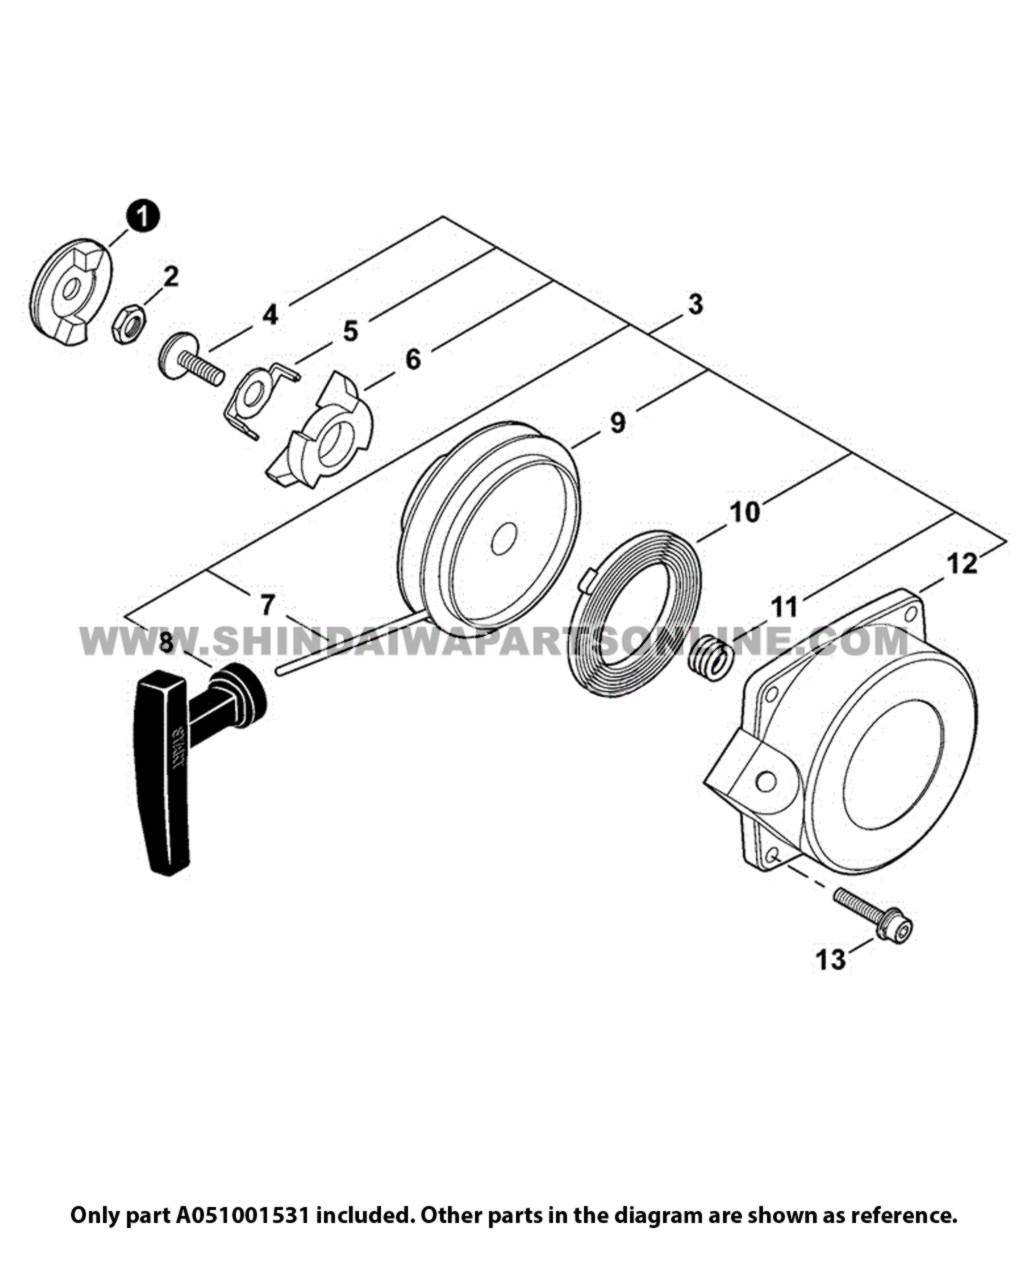 Parts lookup Shindaiwa EB854RT Starter A051001531 OEM diagram